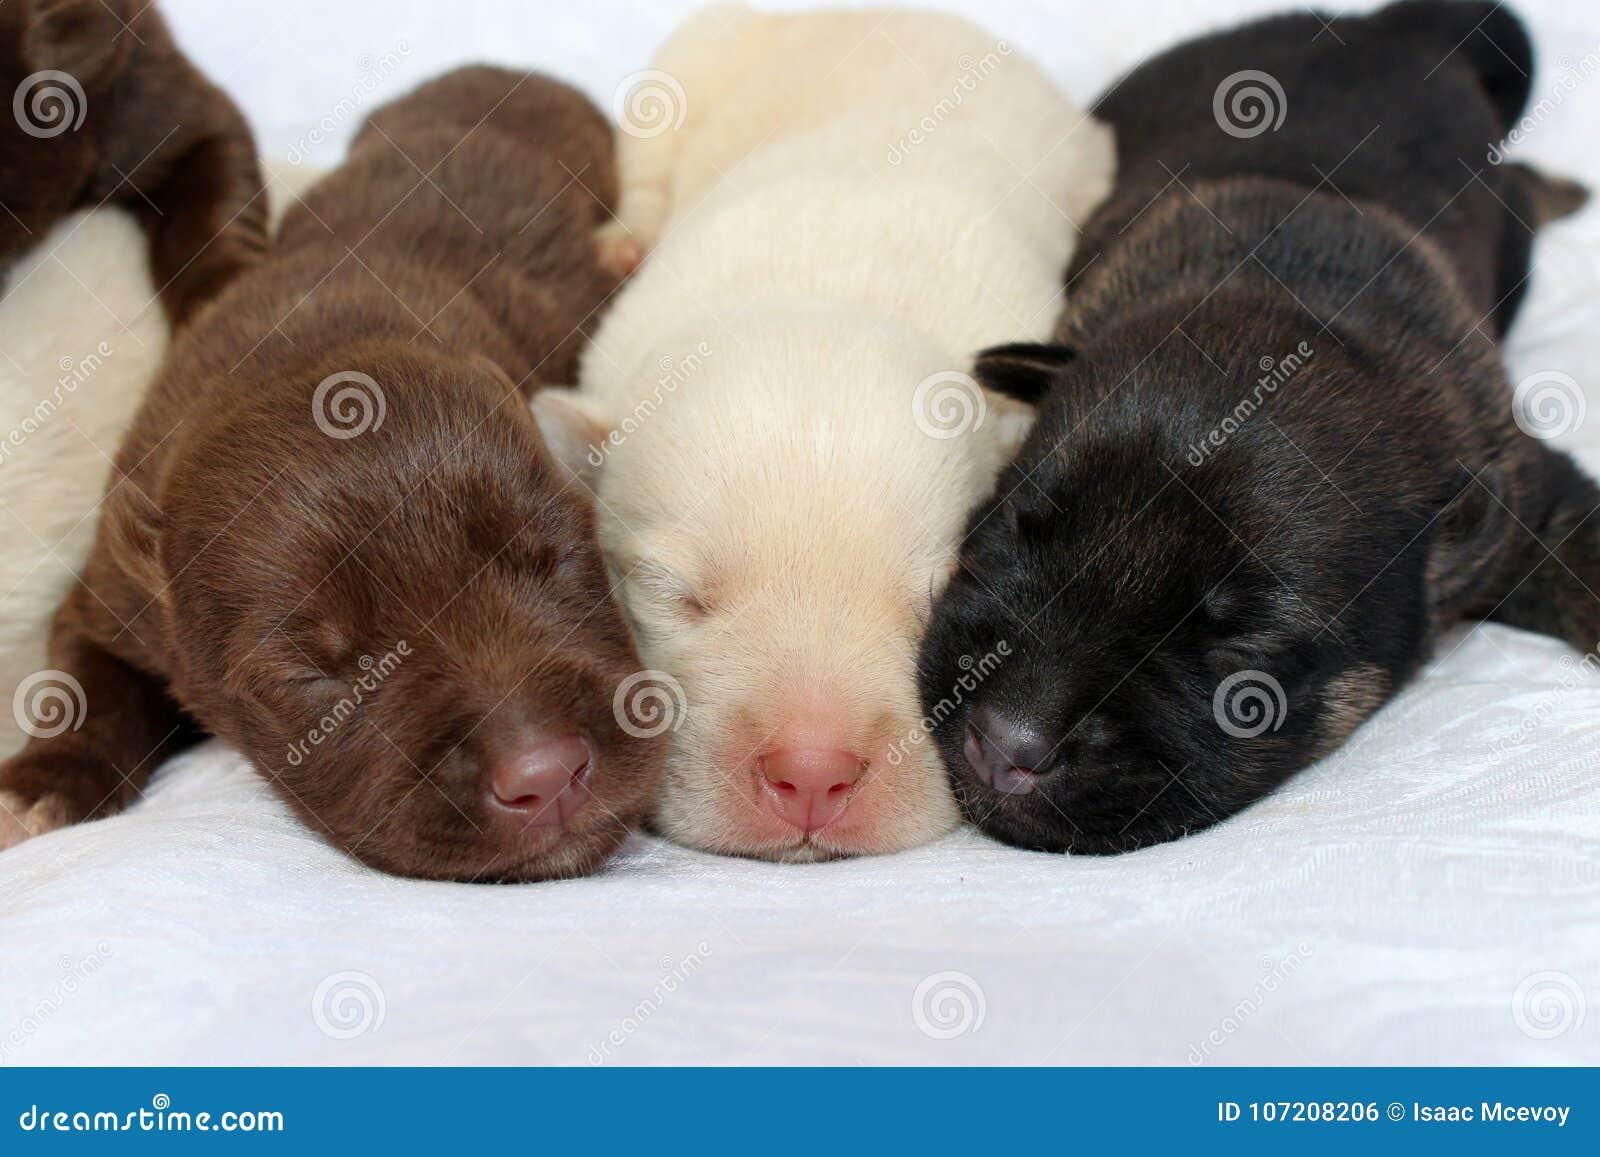 Three Cute Newborn Puppies Stock Photo Image Of Colors 107208206